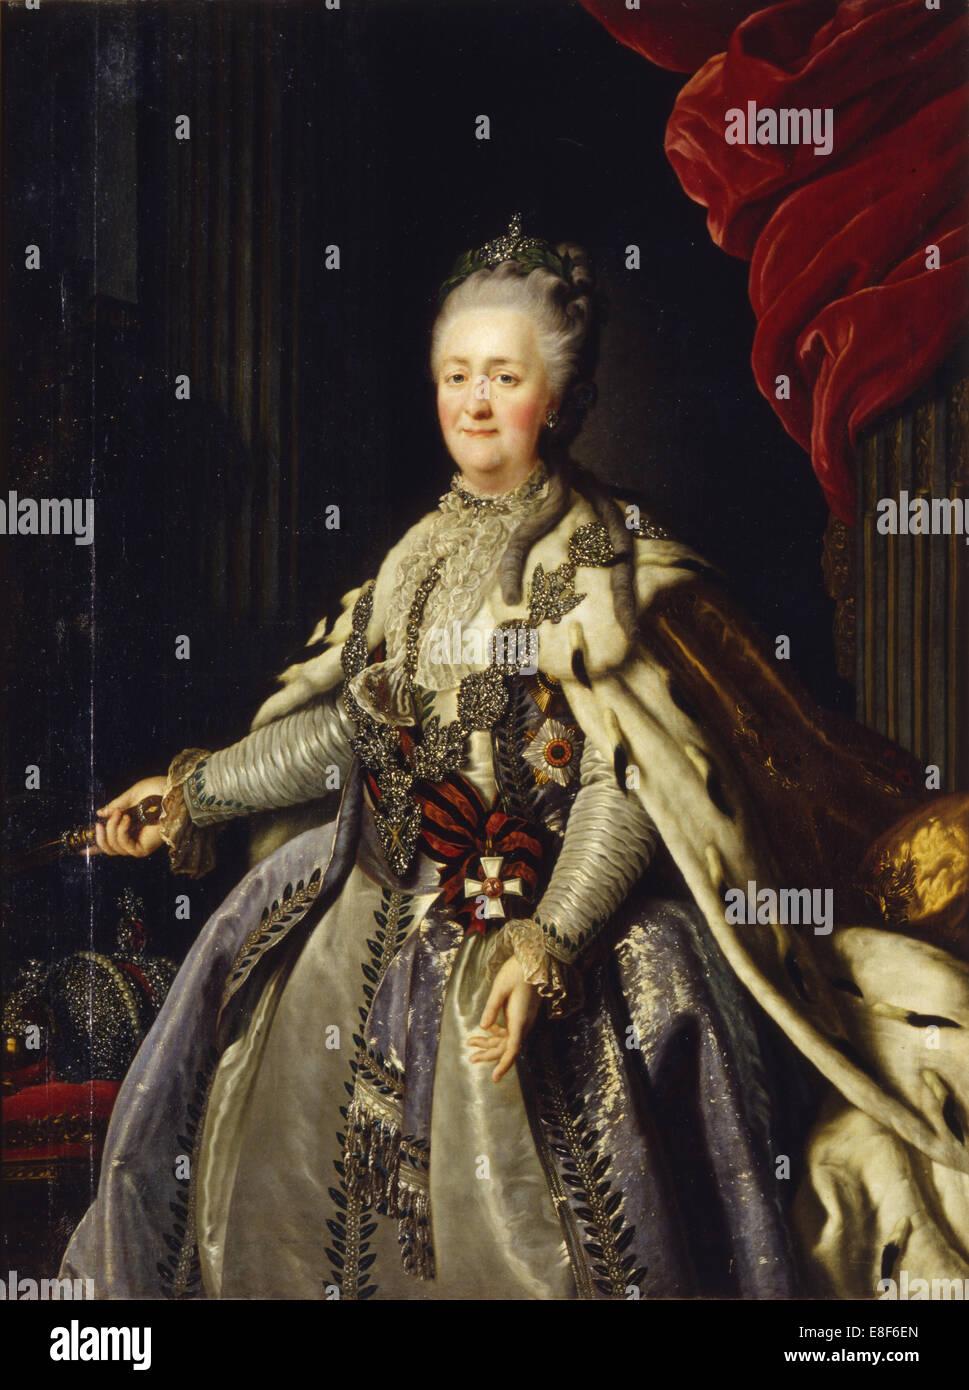 Portrait of Empress Catherine II (1729-1796). Artist: Anonymous - Stock Image